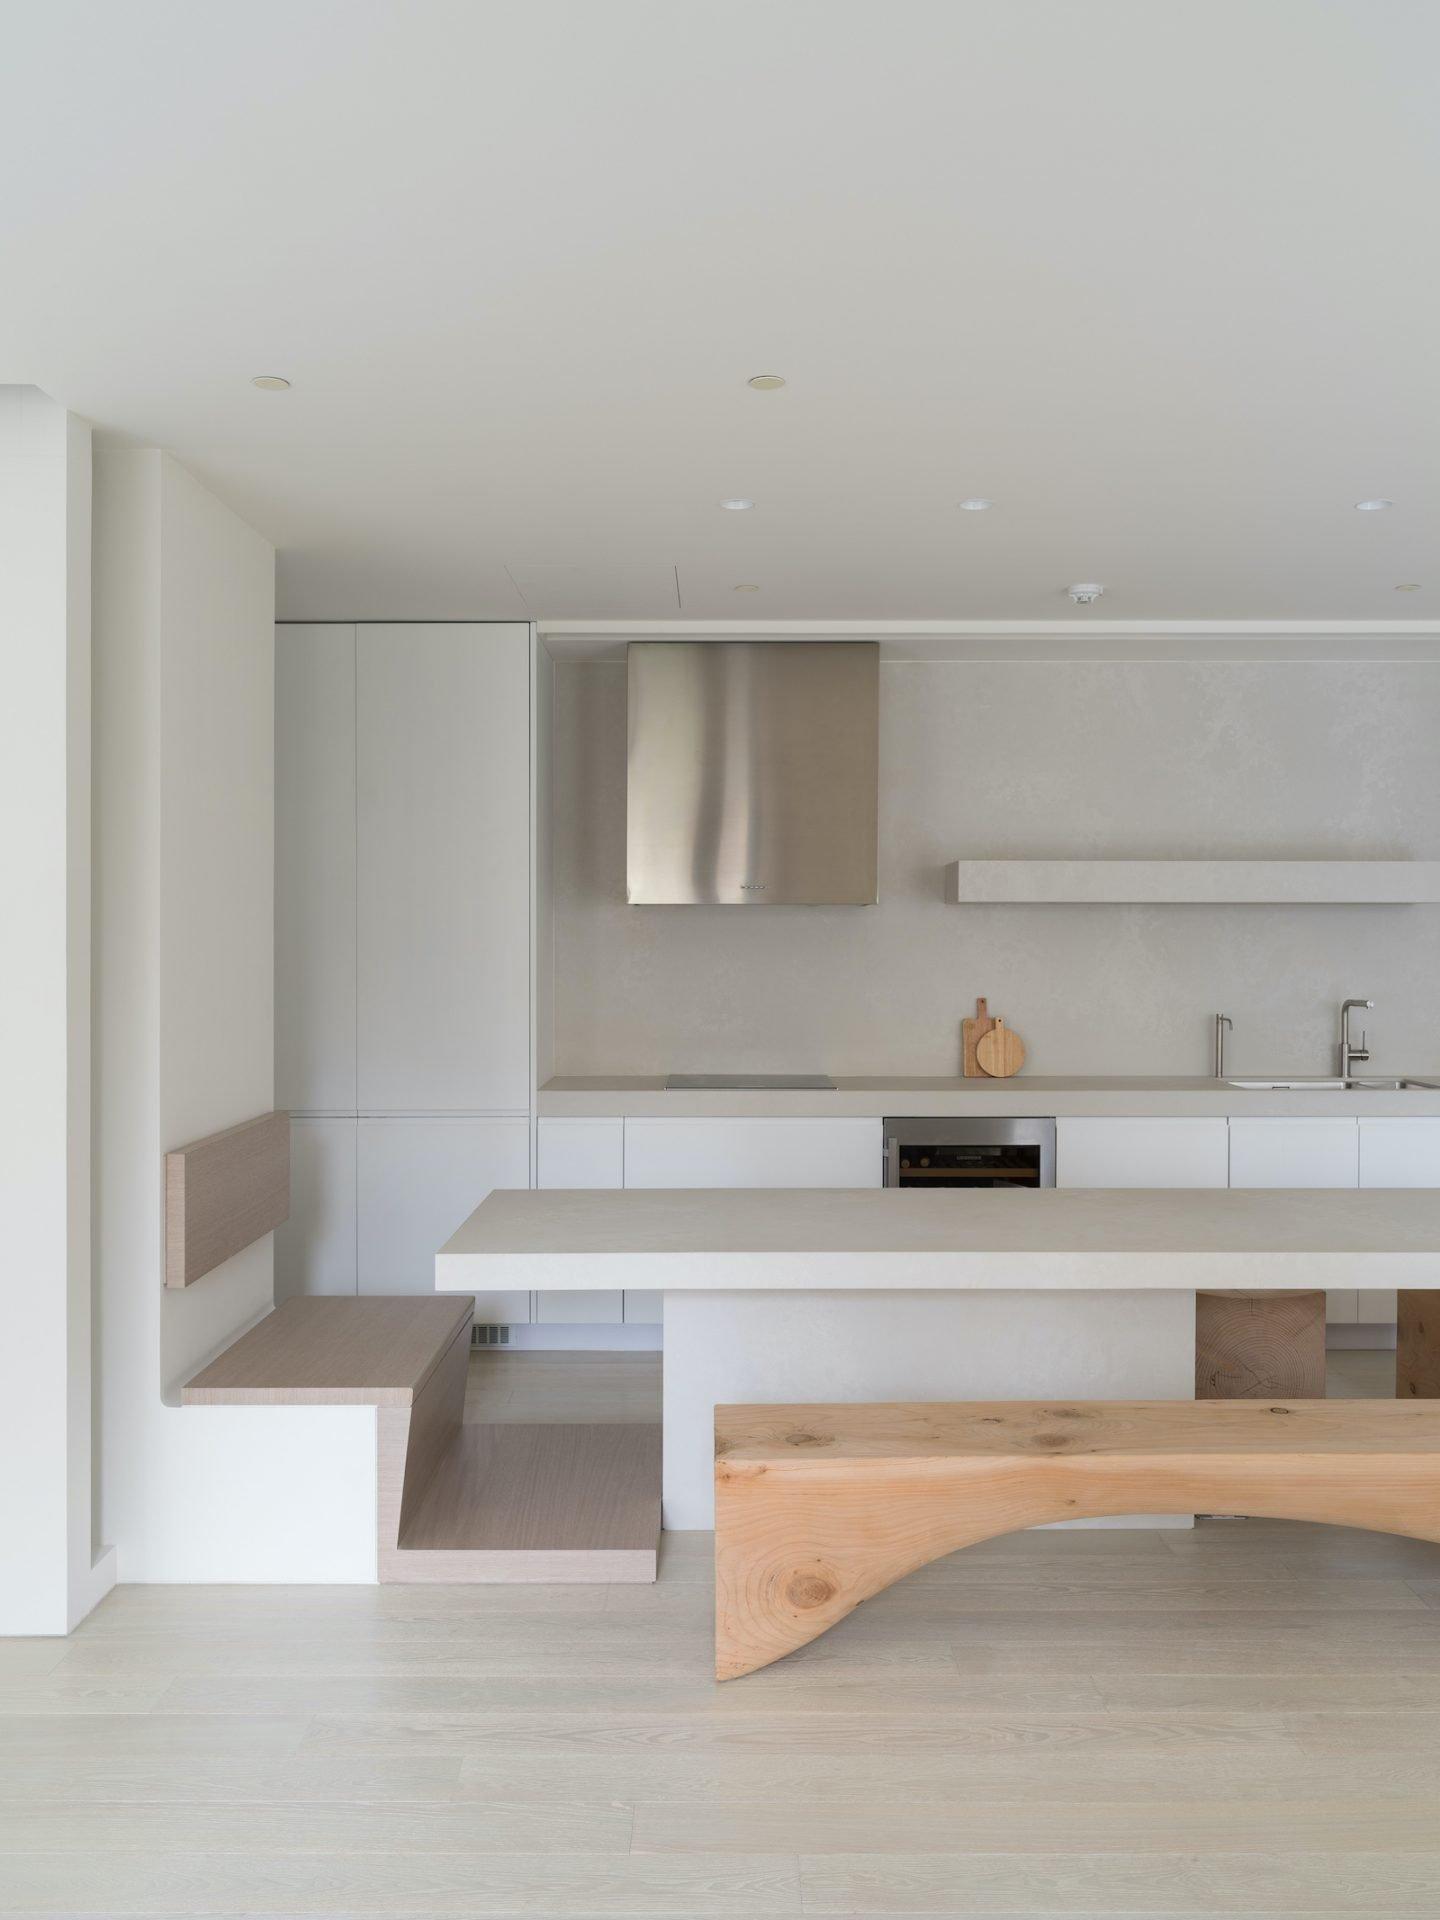 IGNANT-Architecture-Marty-Chou-KOA-Apartment-013